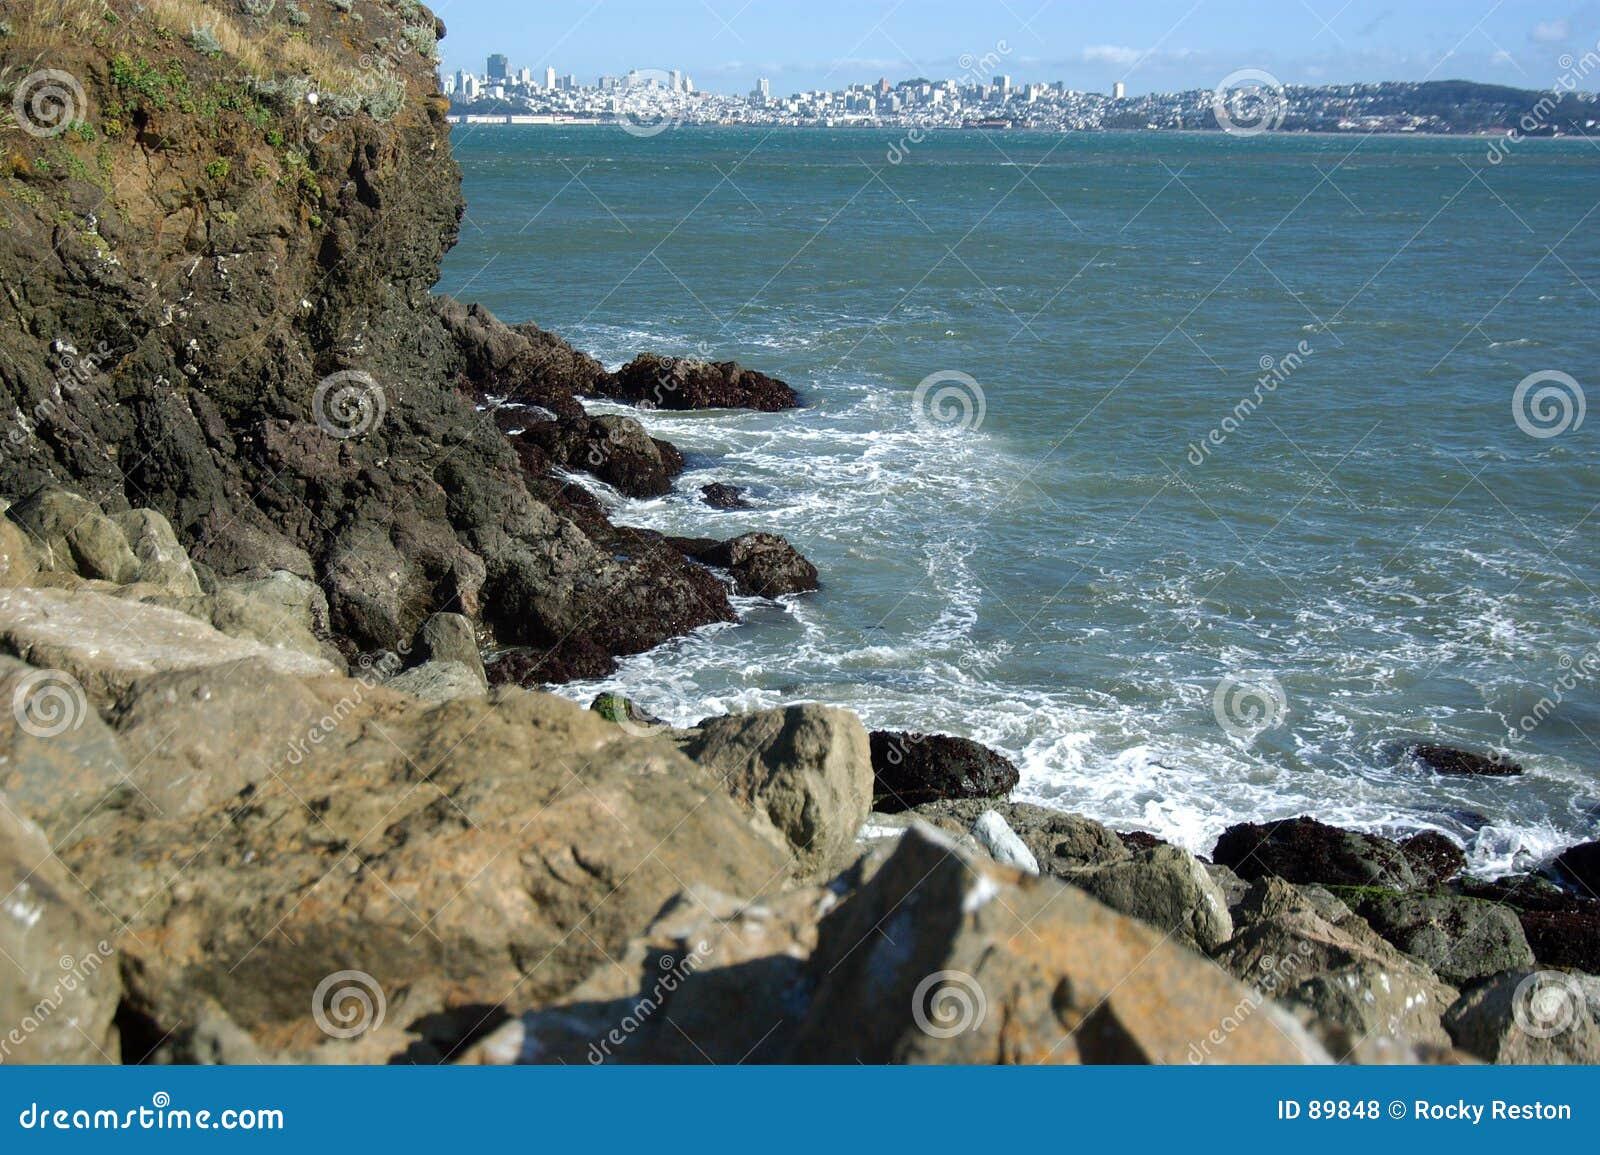 San Francisco bay rock